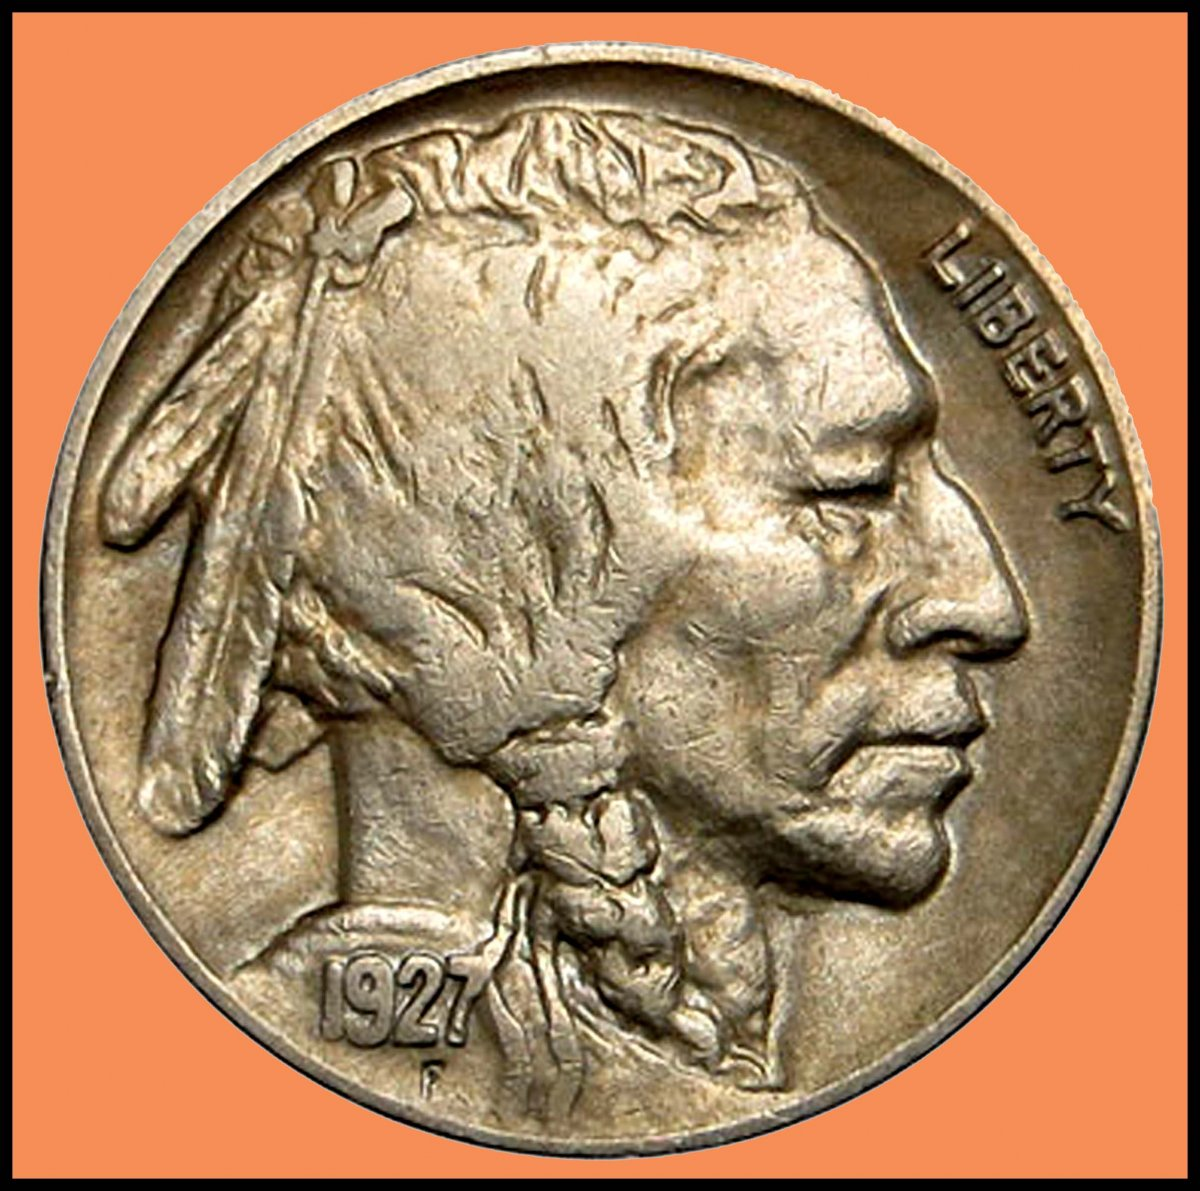 1927-Buffalo Nickel-HEADS-LARGE-1.jpg